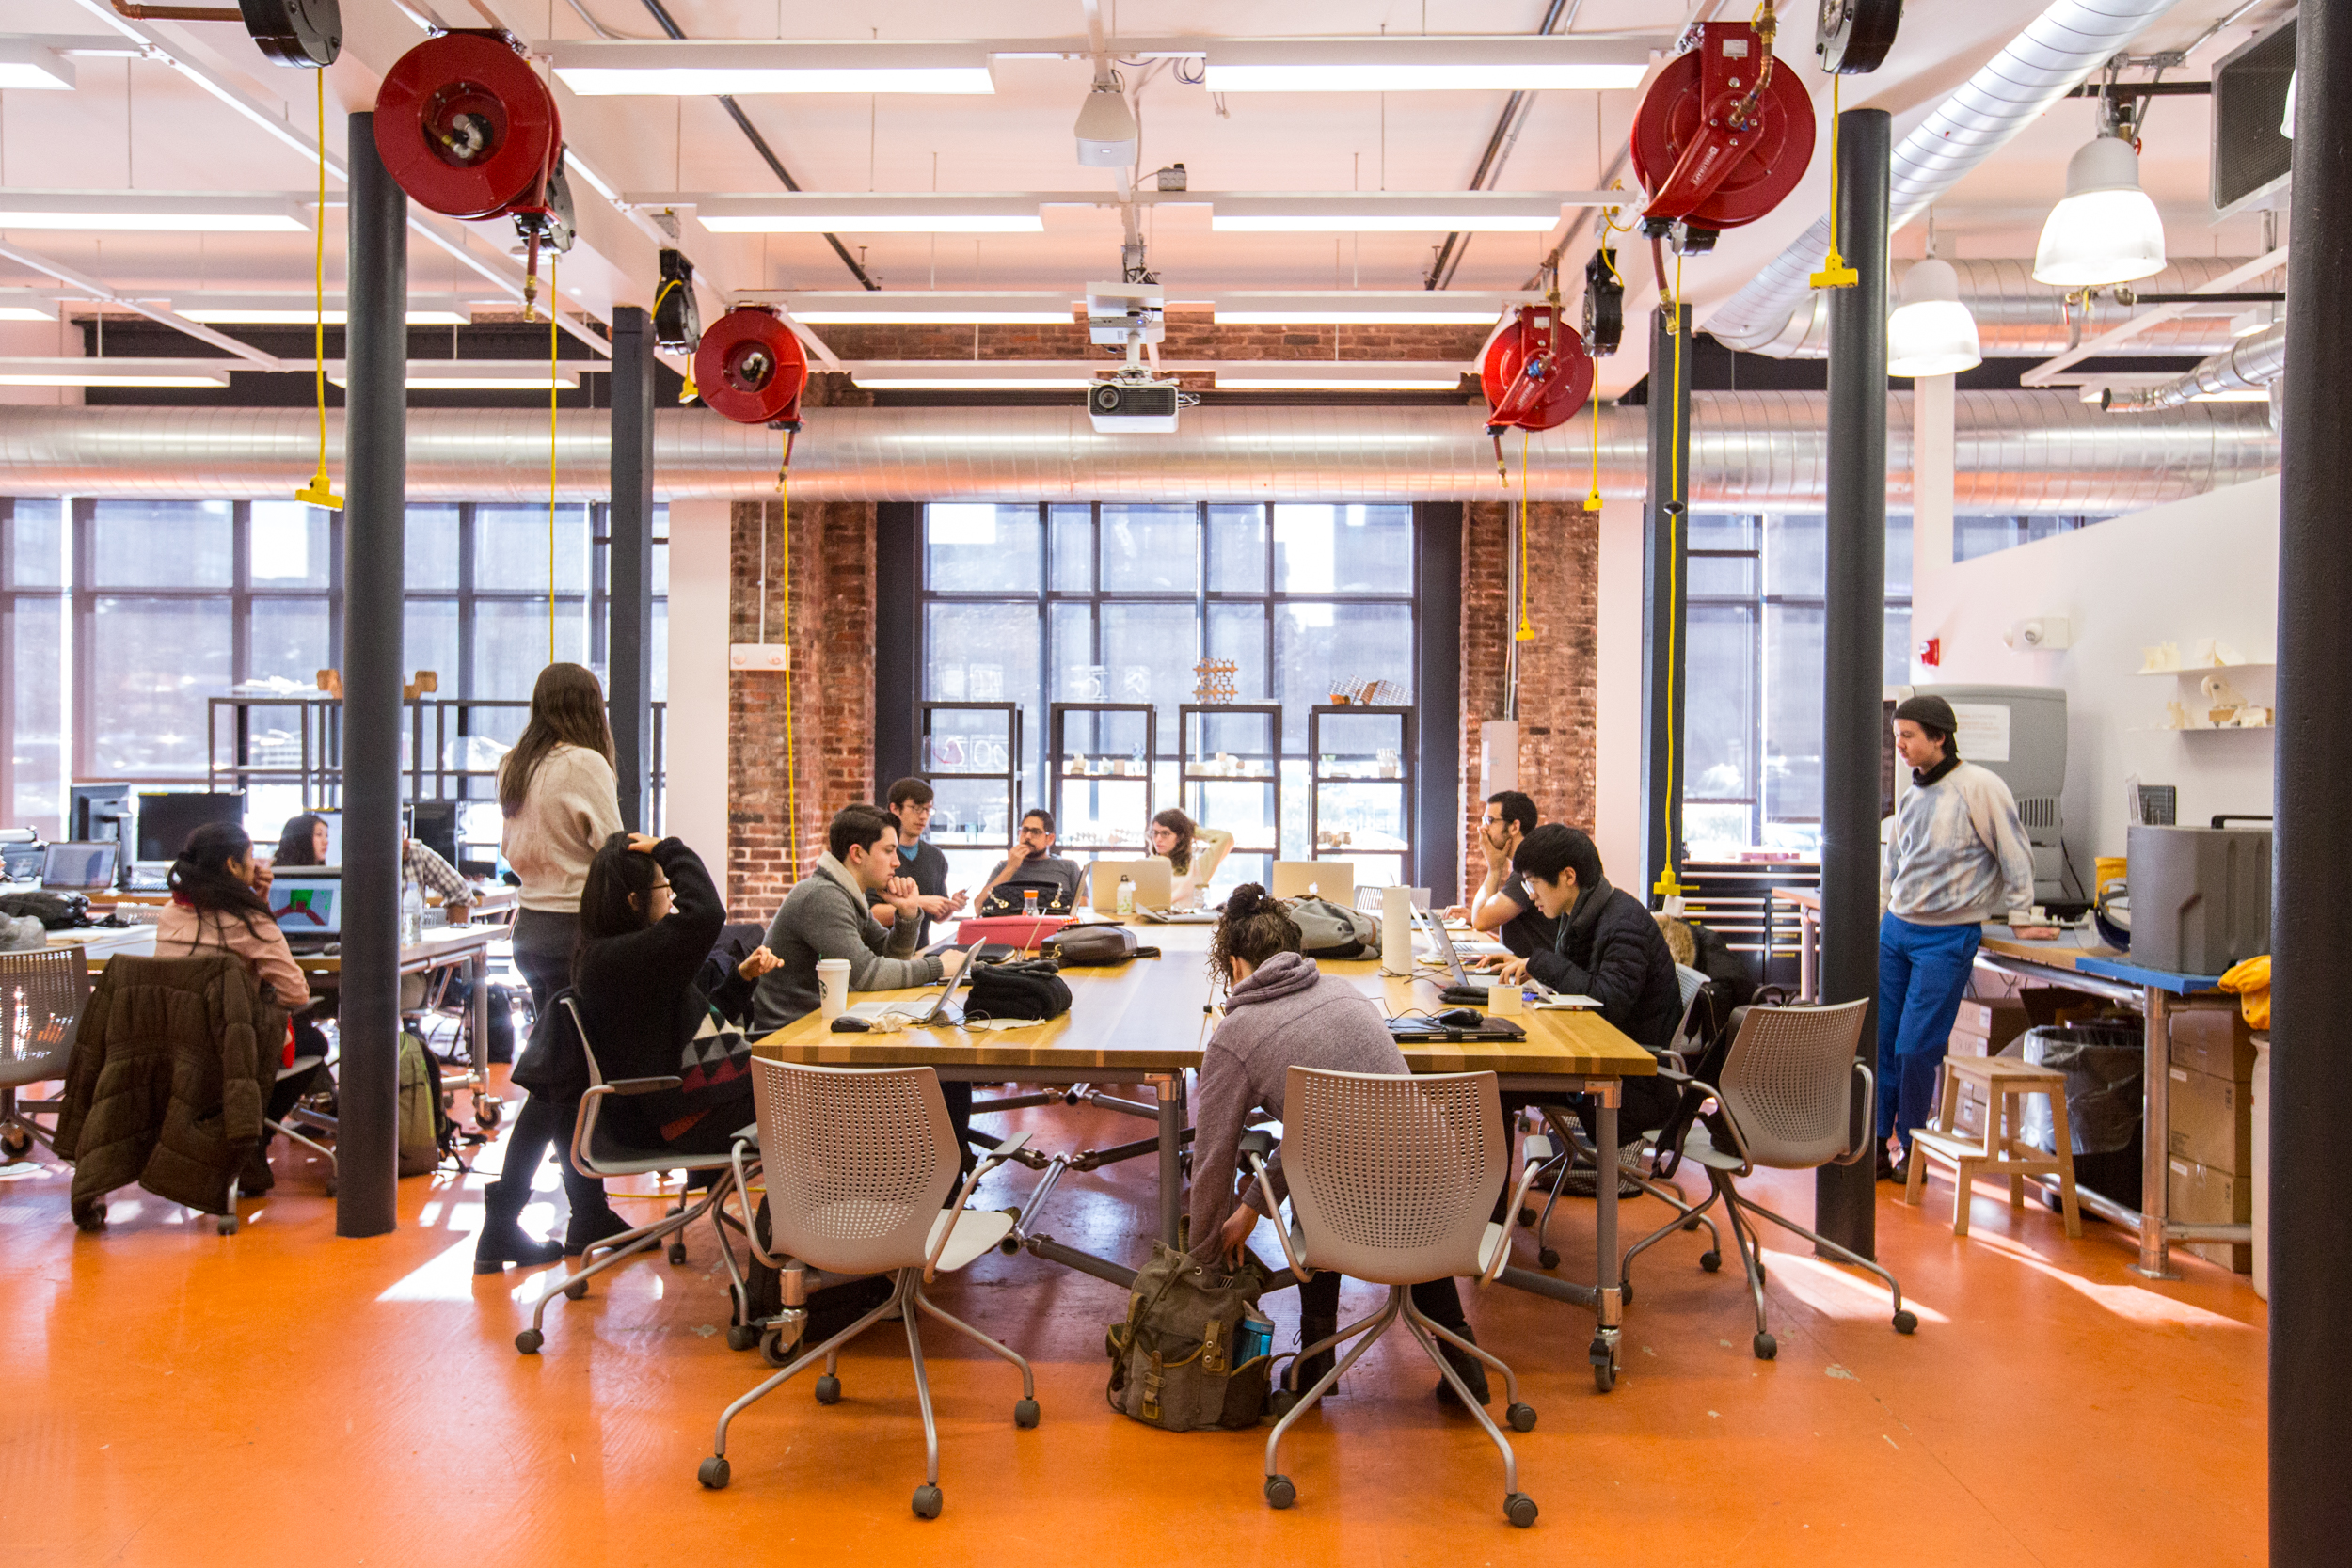 Rhode Island School of Design Co-Works